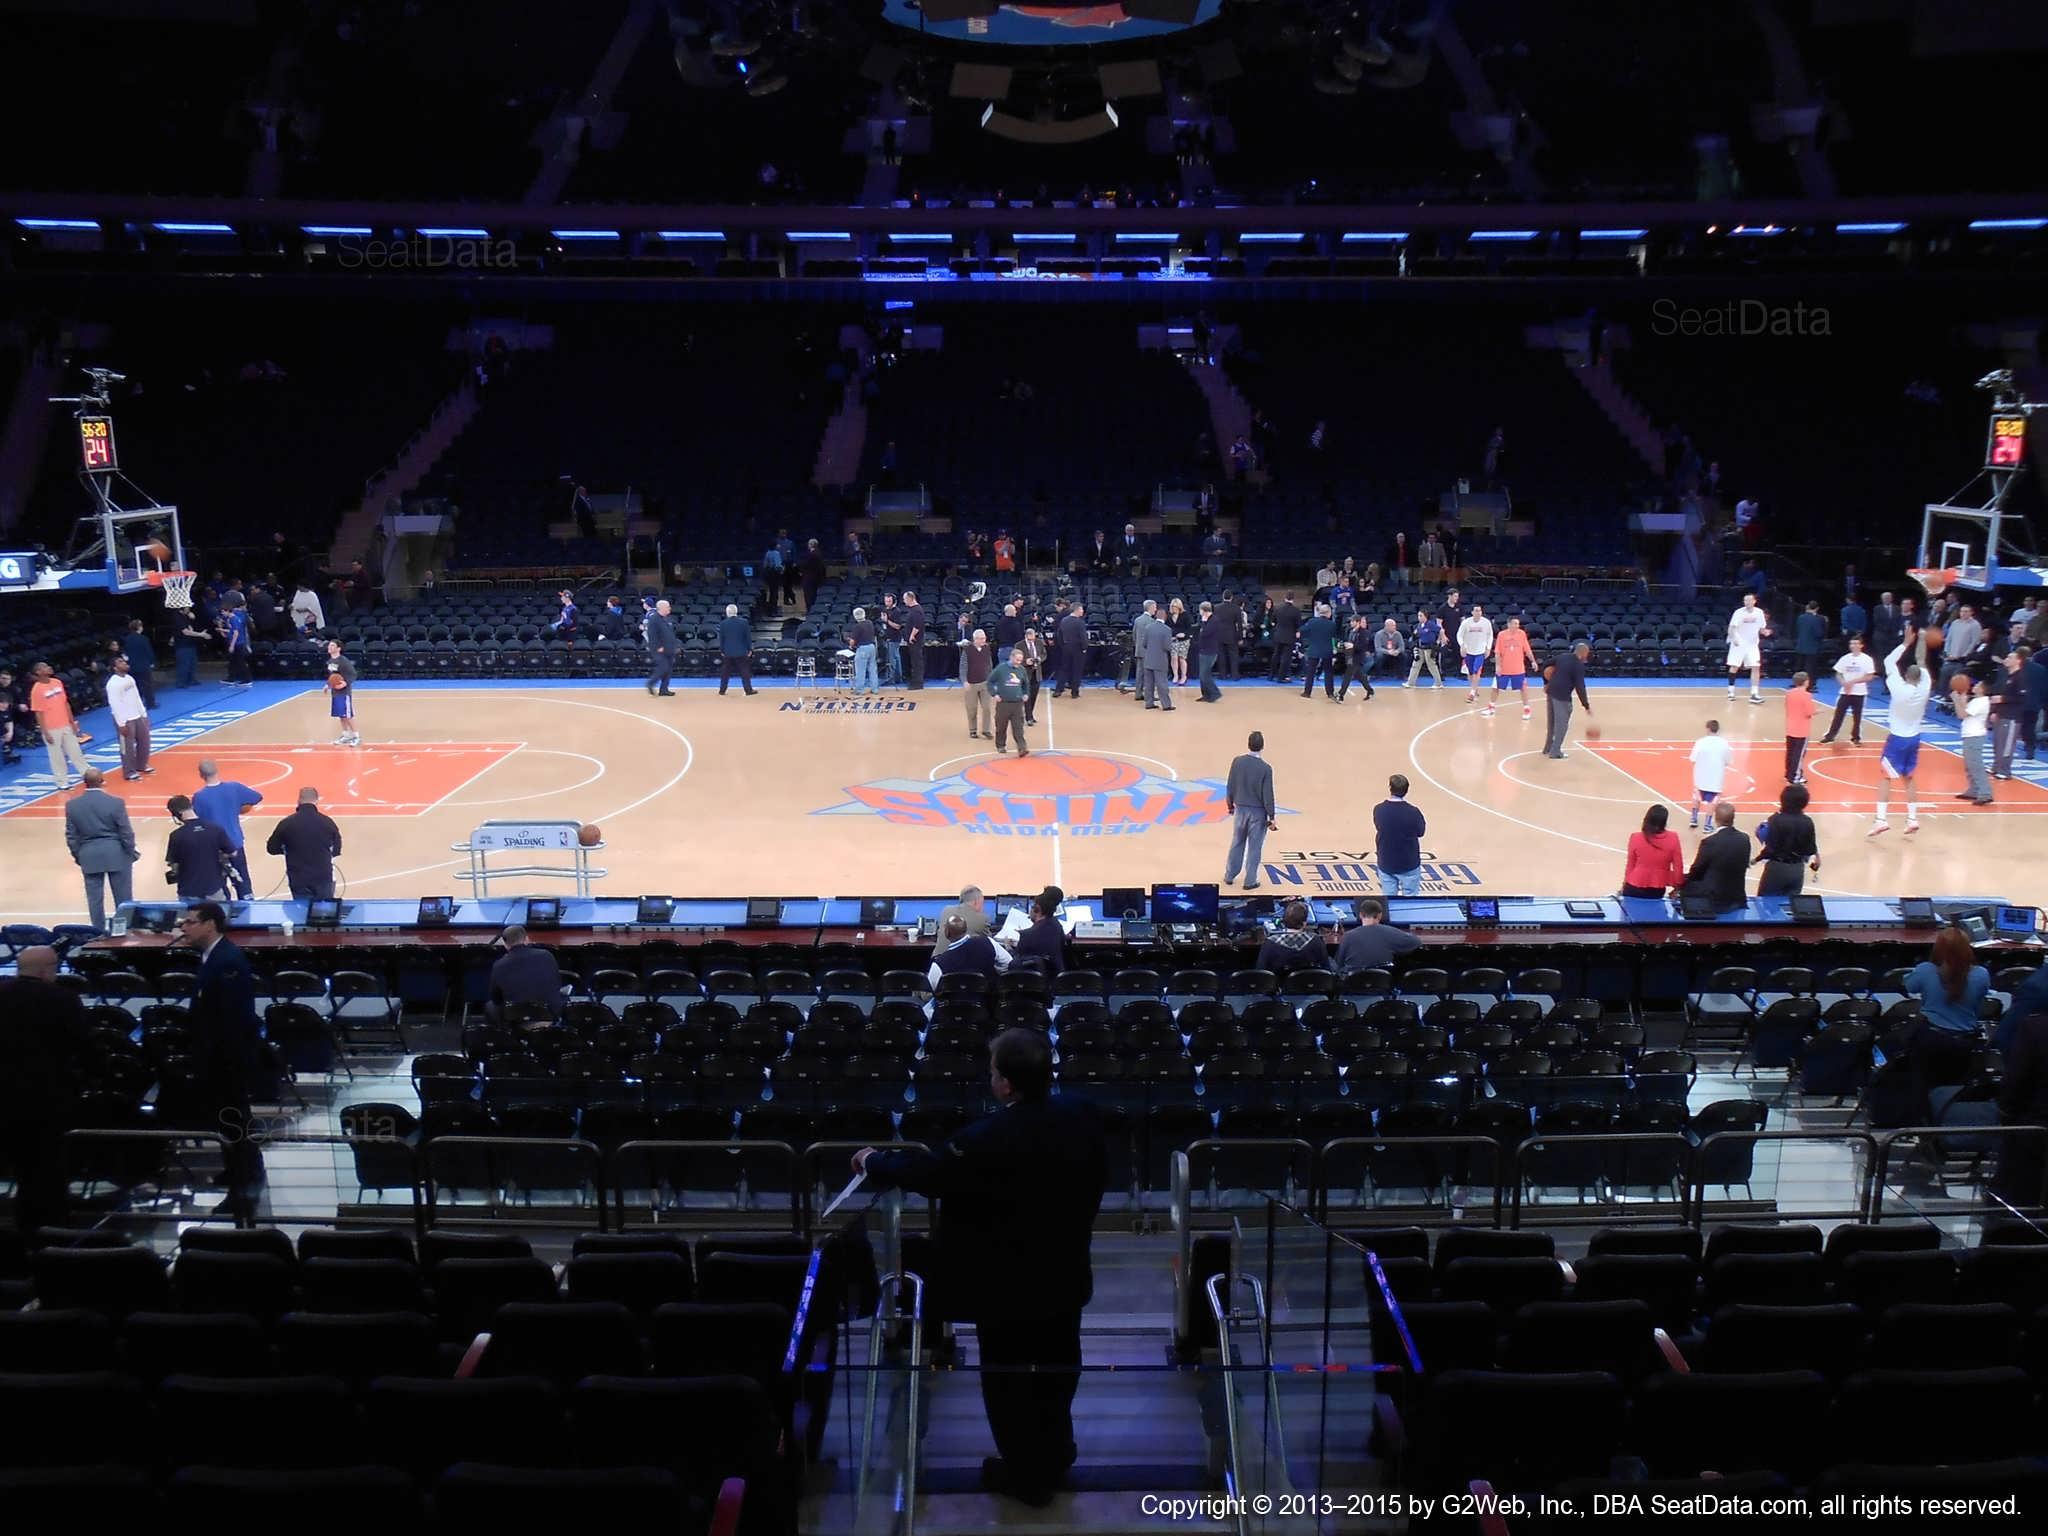 New york knicks madison square garden section 107 - Bruno mars tickets madison square garden ...